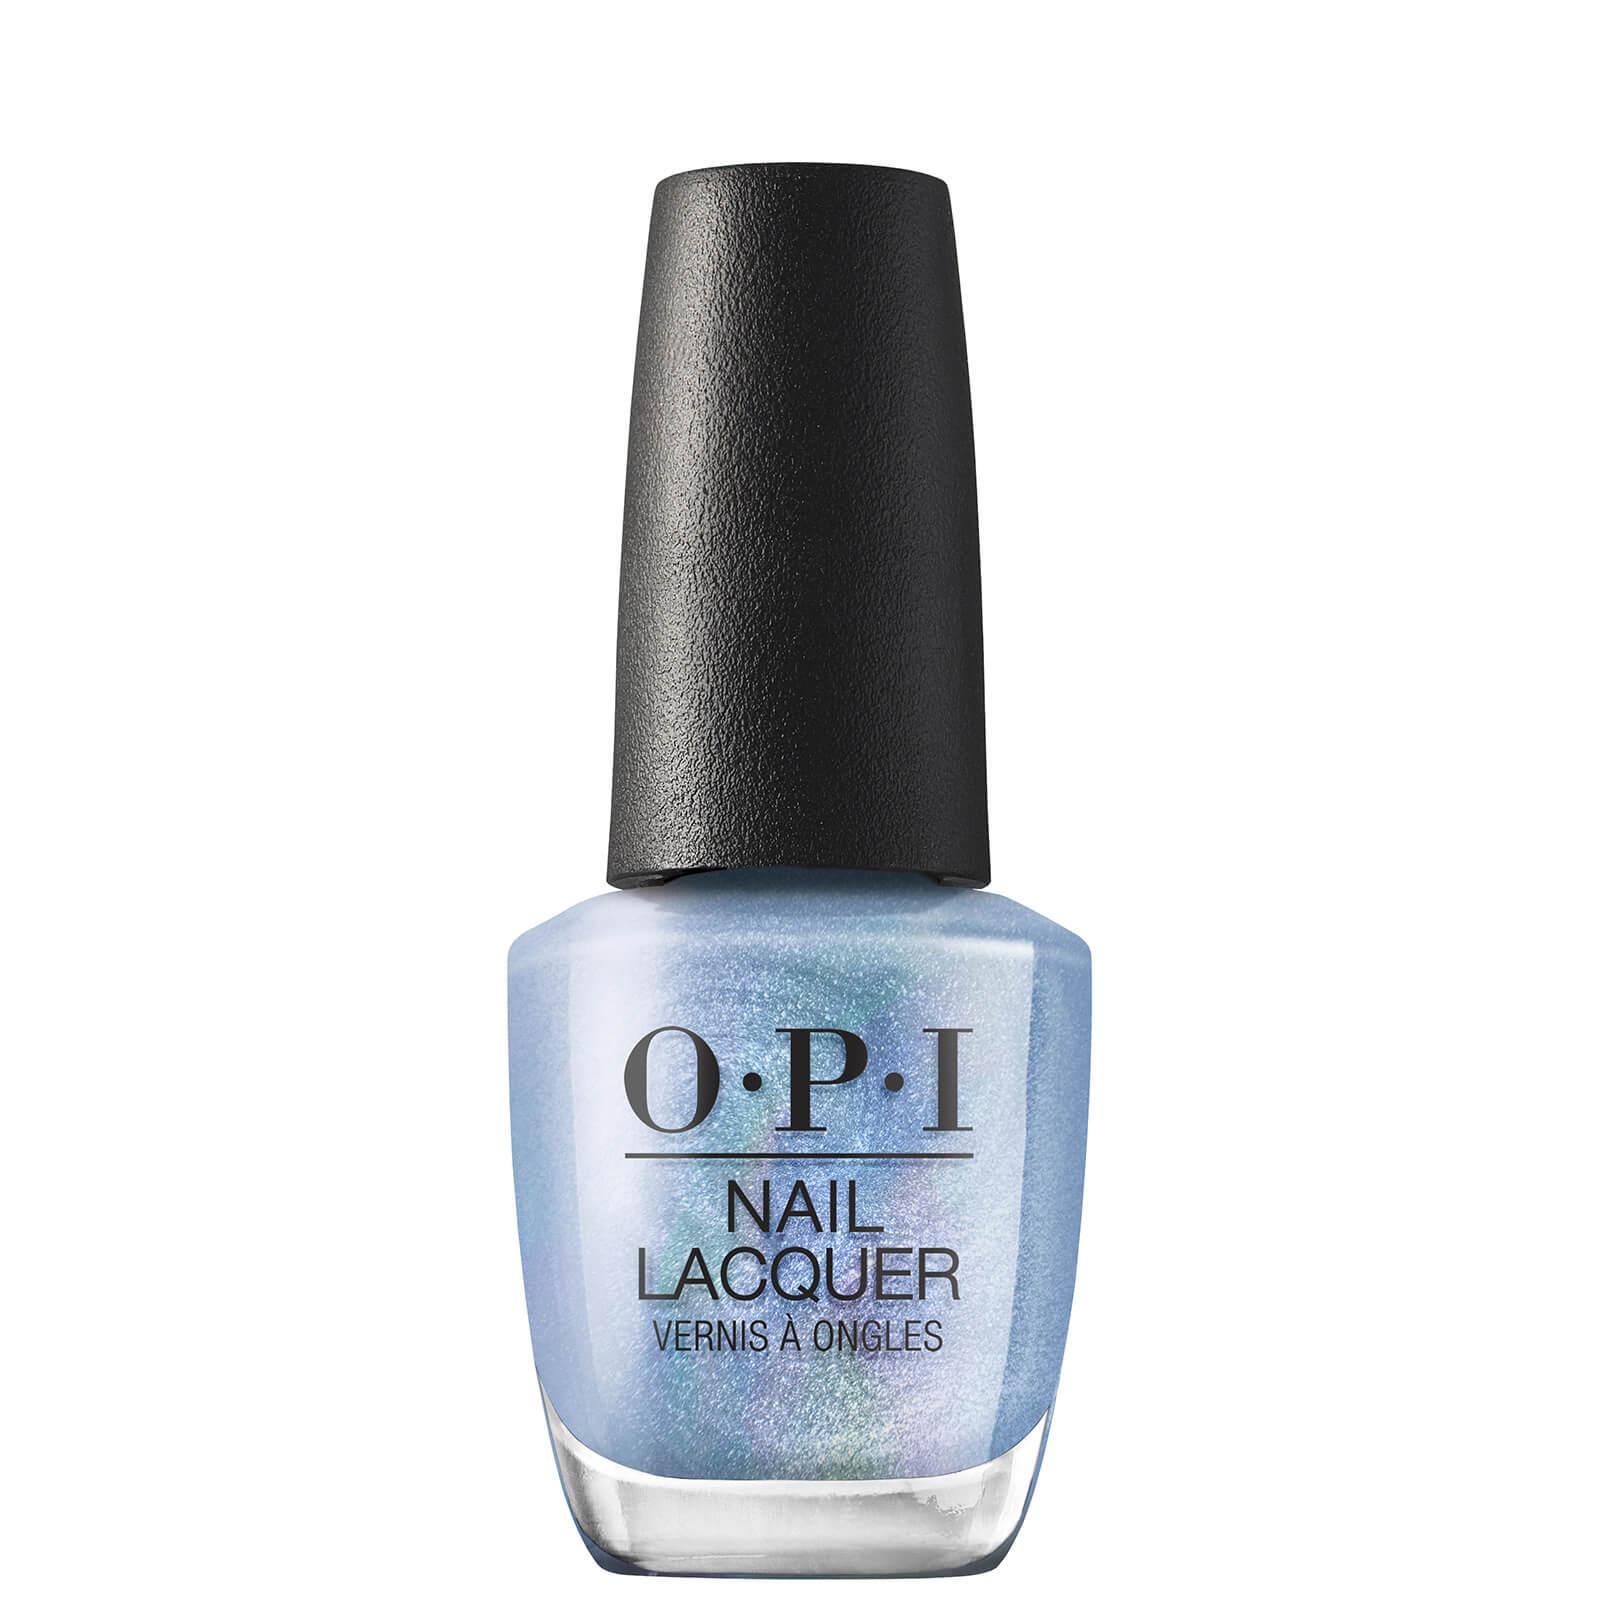 Купить OPI Nail Polish DTLA Collection 15ml (Various Shades) - Angels Flight to Starry Nights